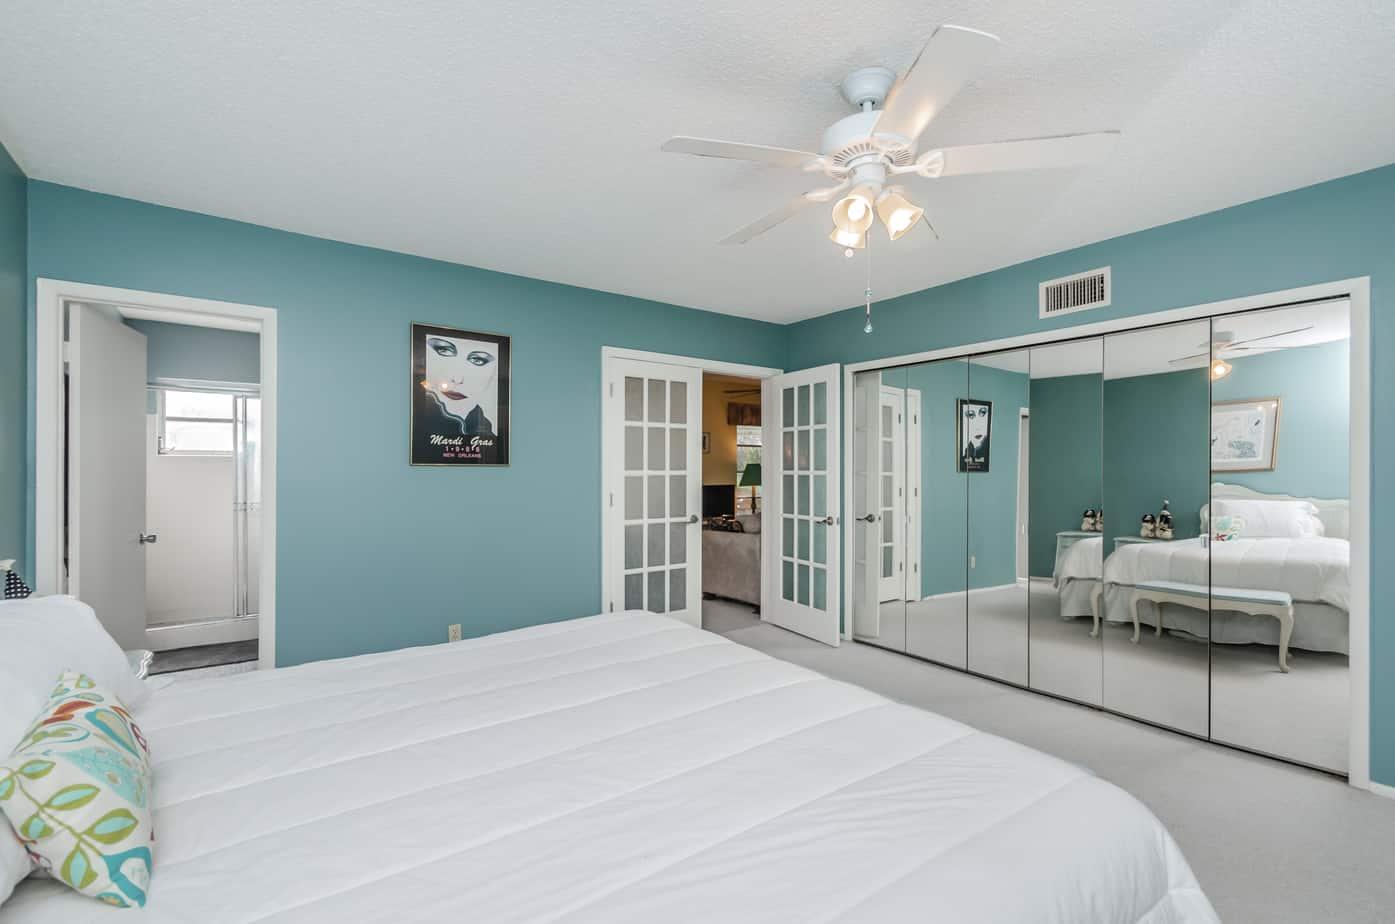 2285-Israeli-Dr-#17-Clearwater-Fl-33763-bedroom-2